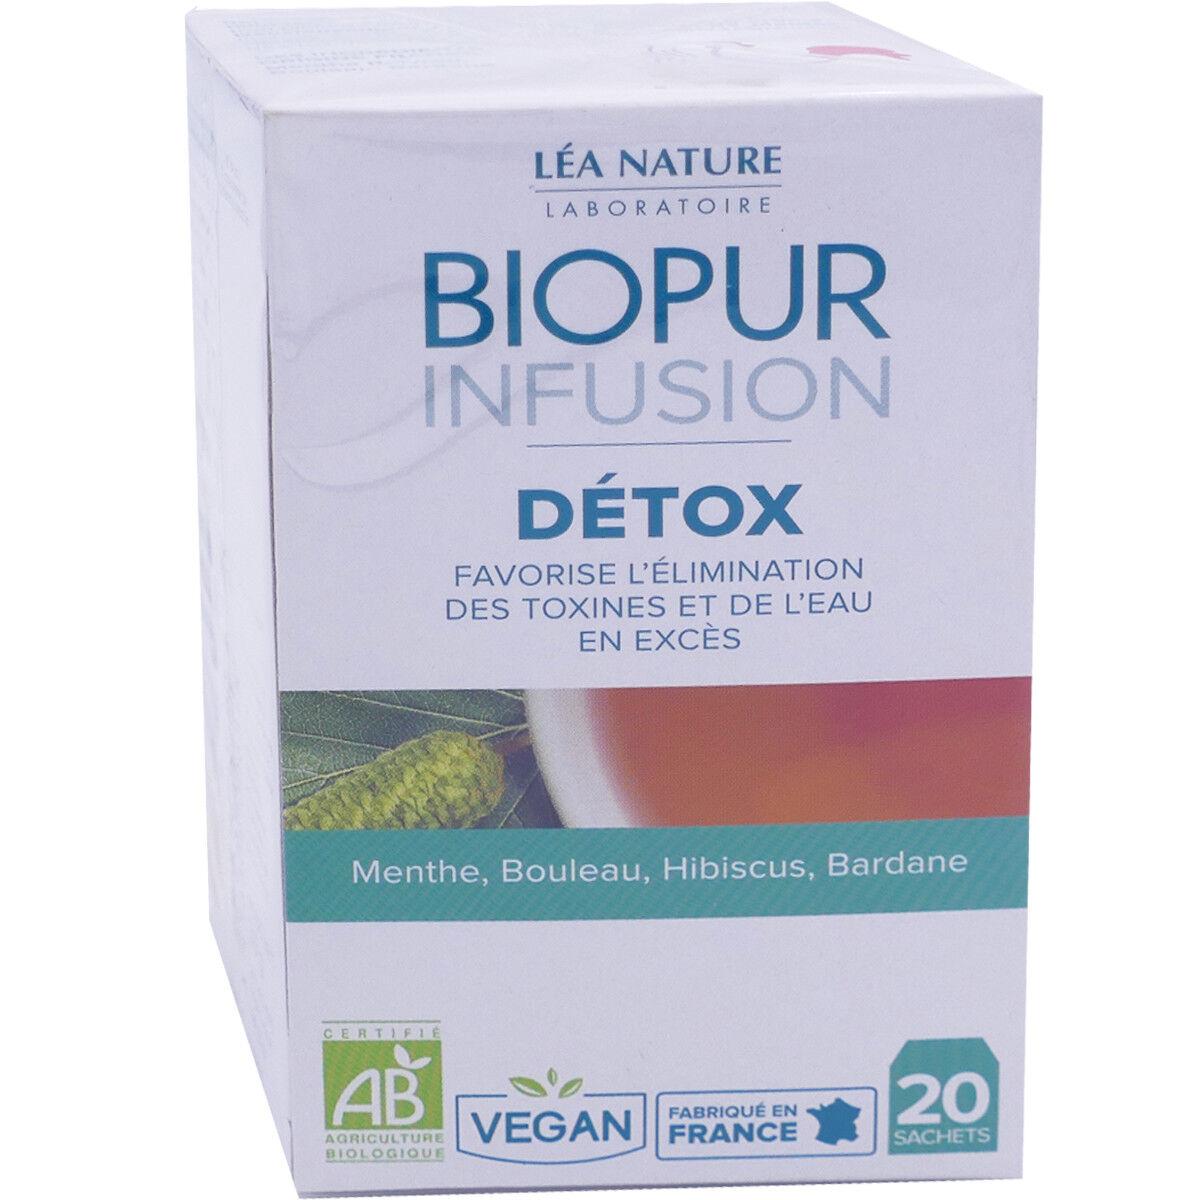 LEA NATURE Biopur infusion detox 20 sachets bio